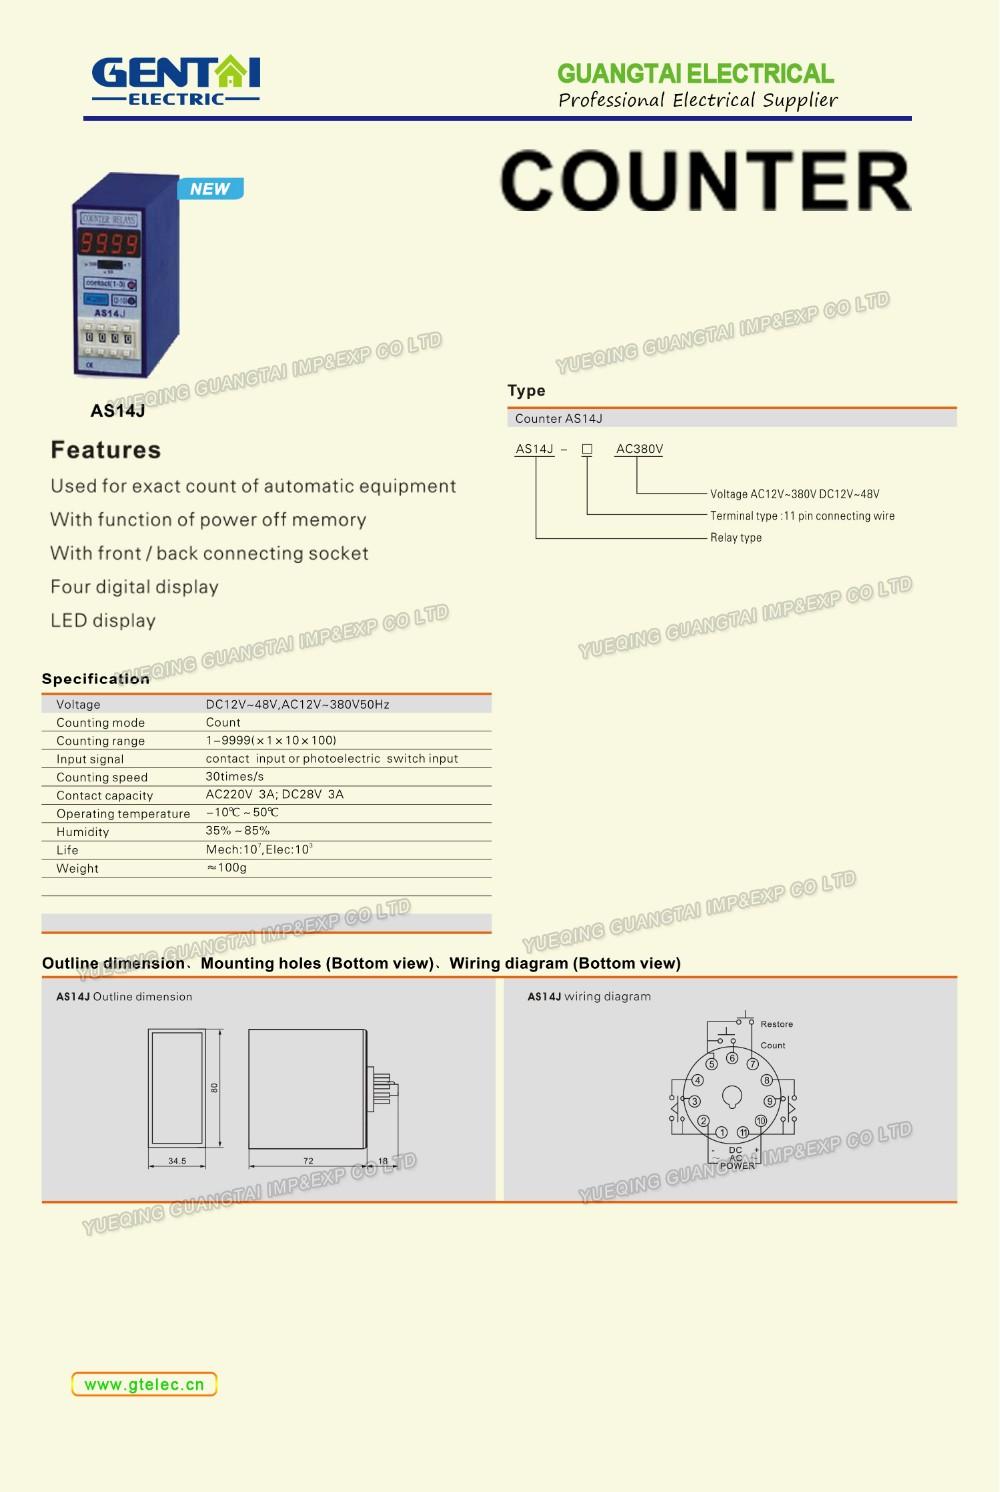 qing wire diagram enthusiast wiring diagrams u2022 rh rasalibre co Wire Diagram 240V Hot Tub Home Electrical Wiring Diagrams